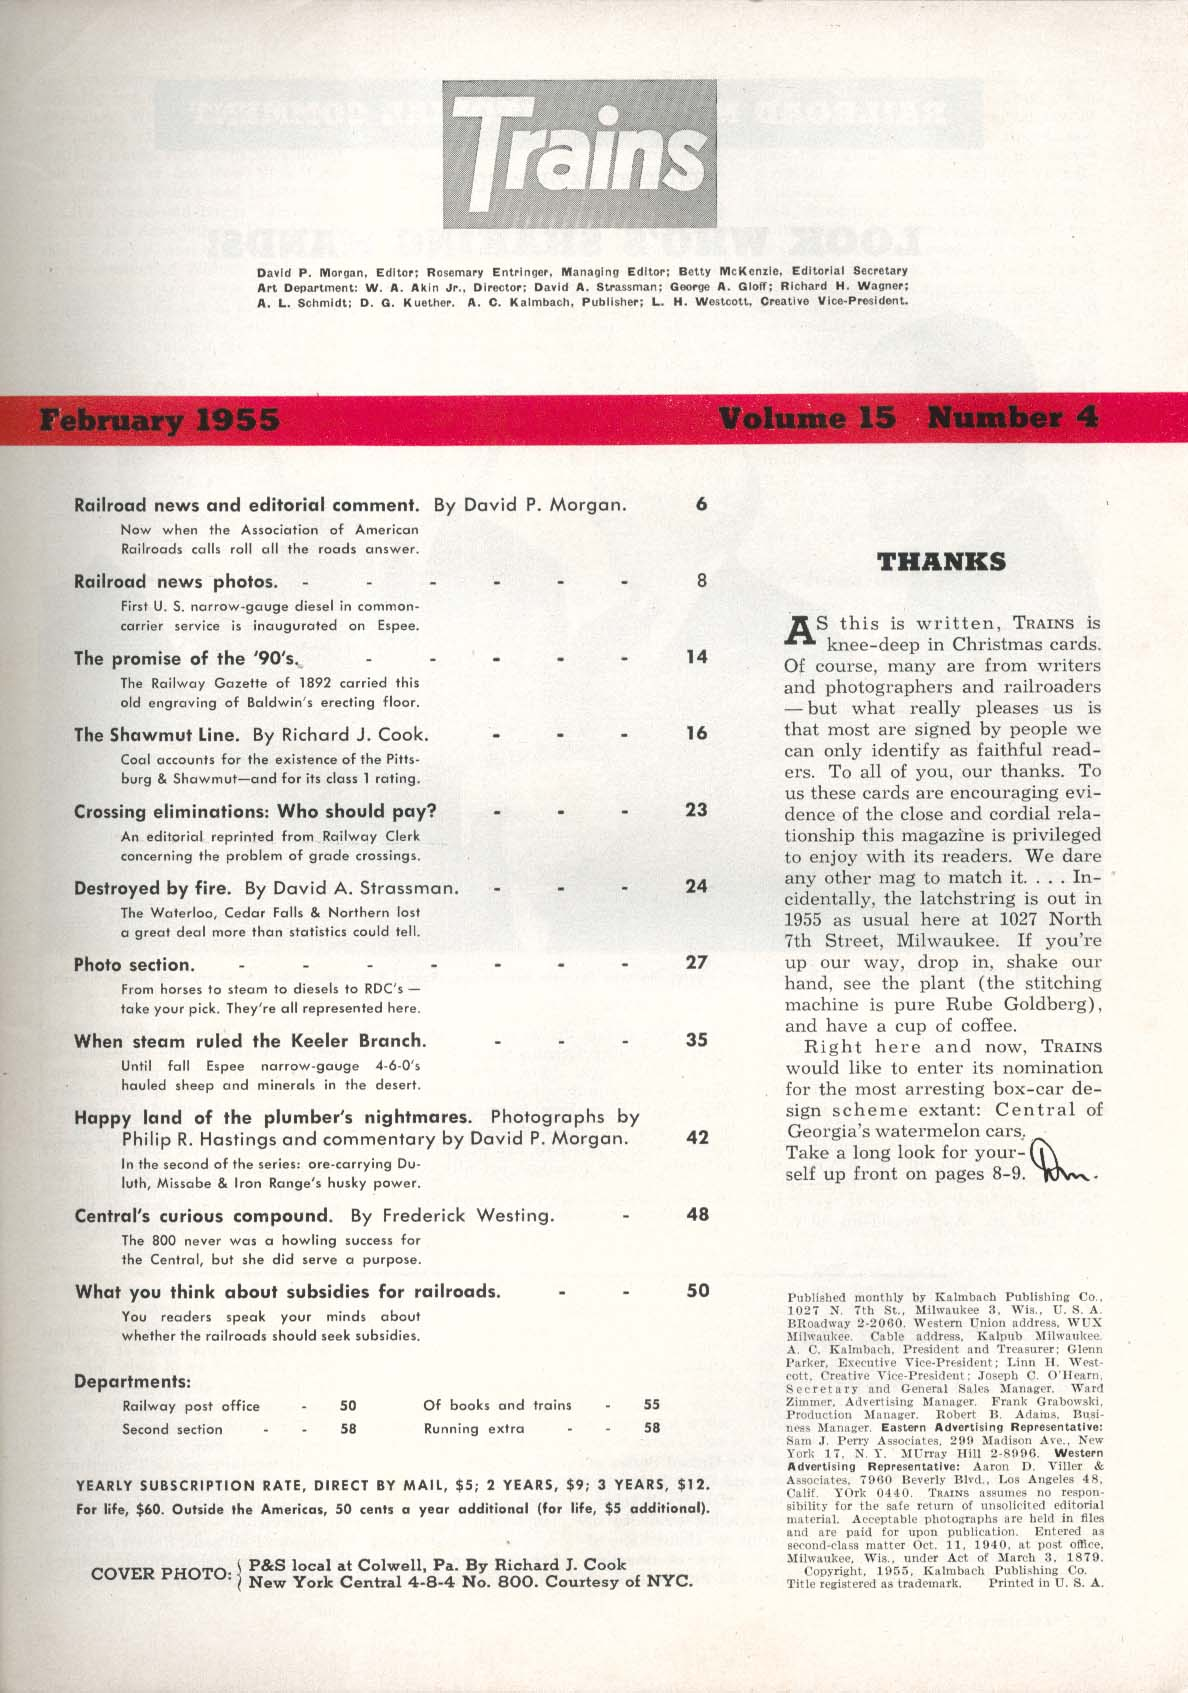 TRAINS Railway Gazette 1892 Waterloo Cedar Falls Northern Keeler Branch 2 1955